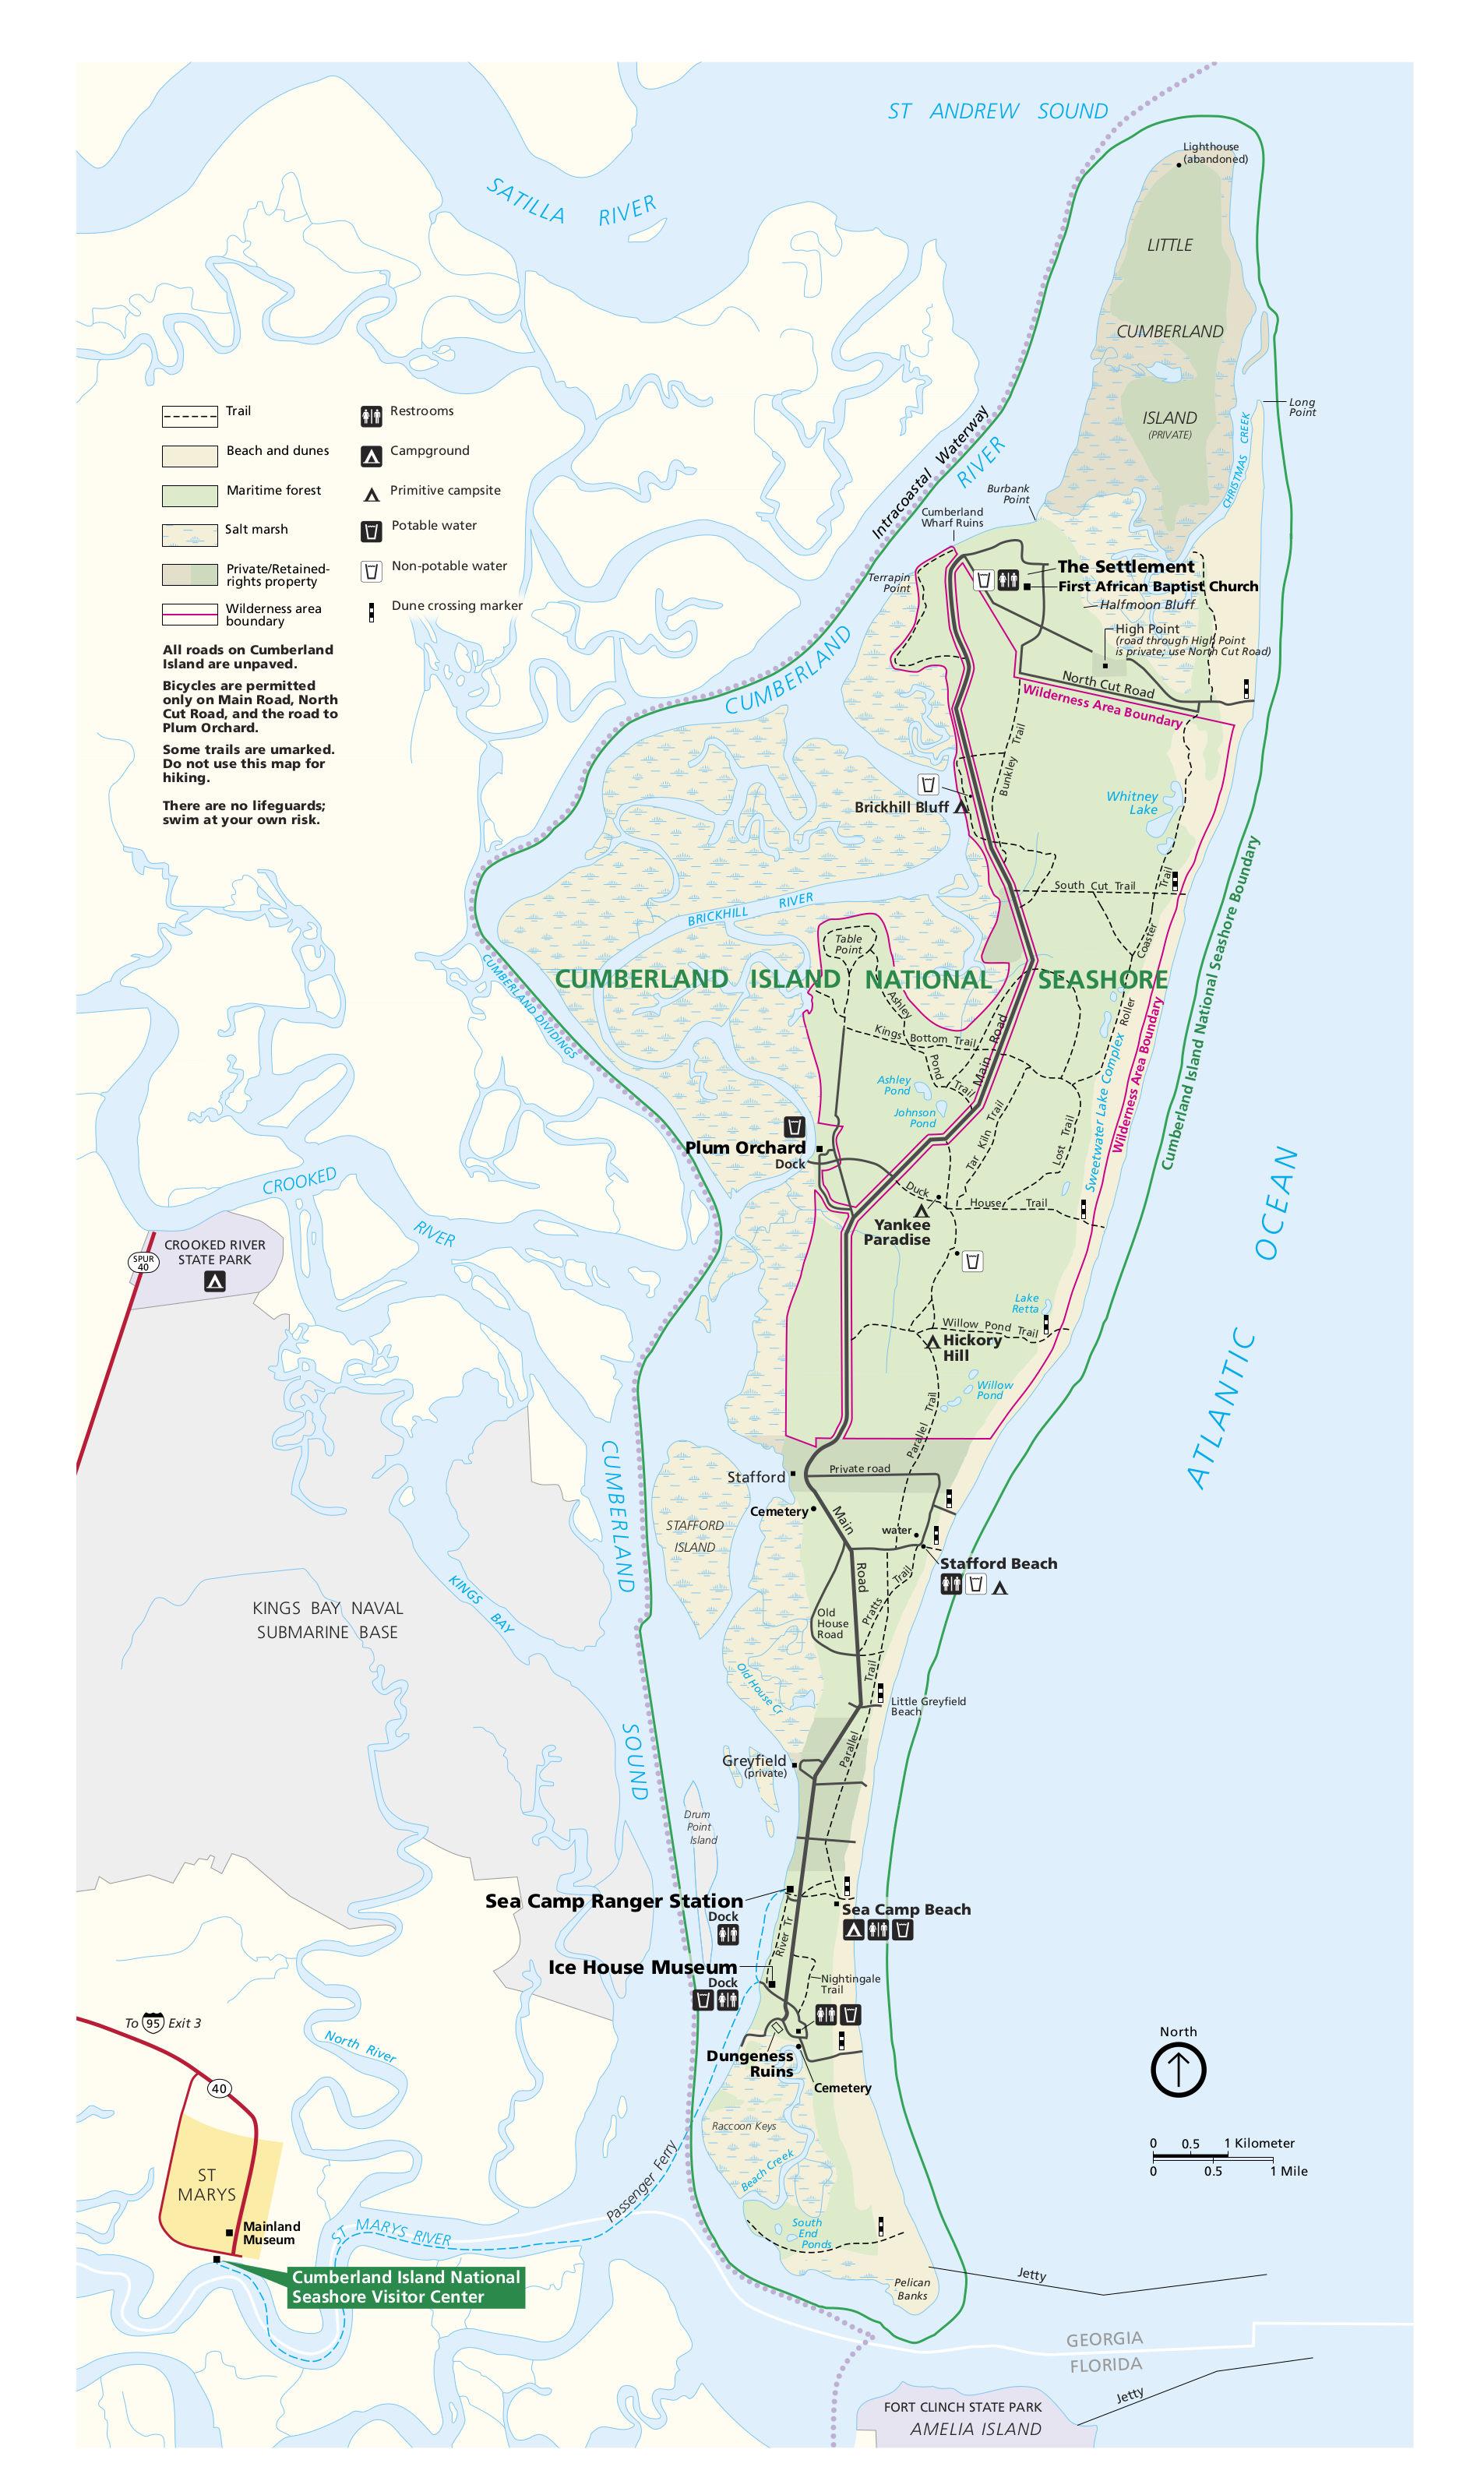 Map Of Cumberland Island Cumberland Island Maps | NPMaps.  just free maps, period.